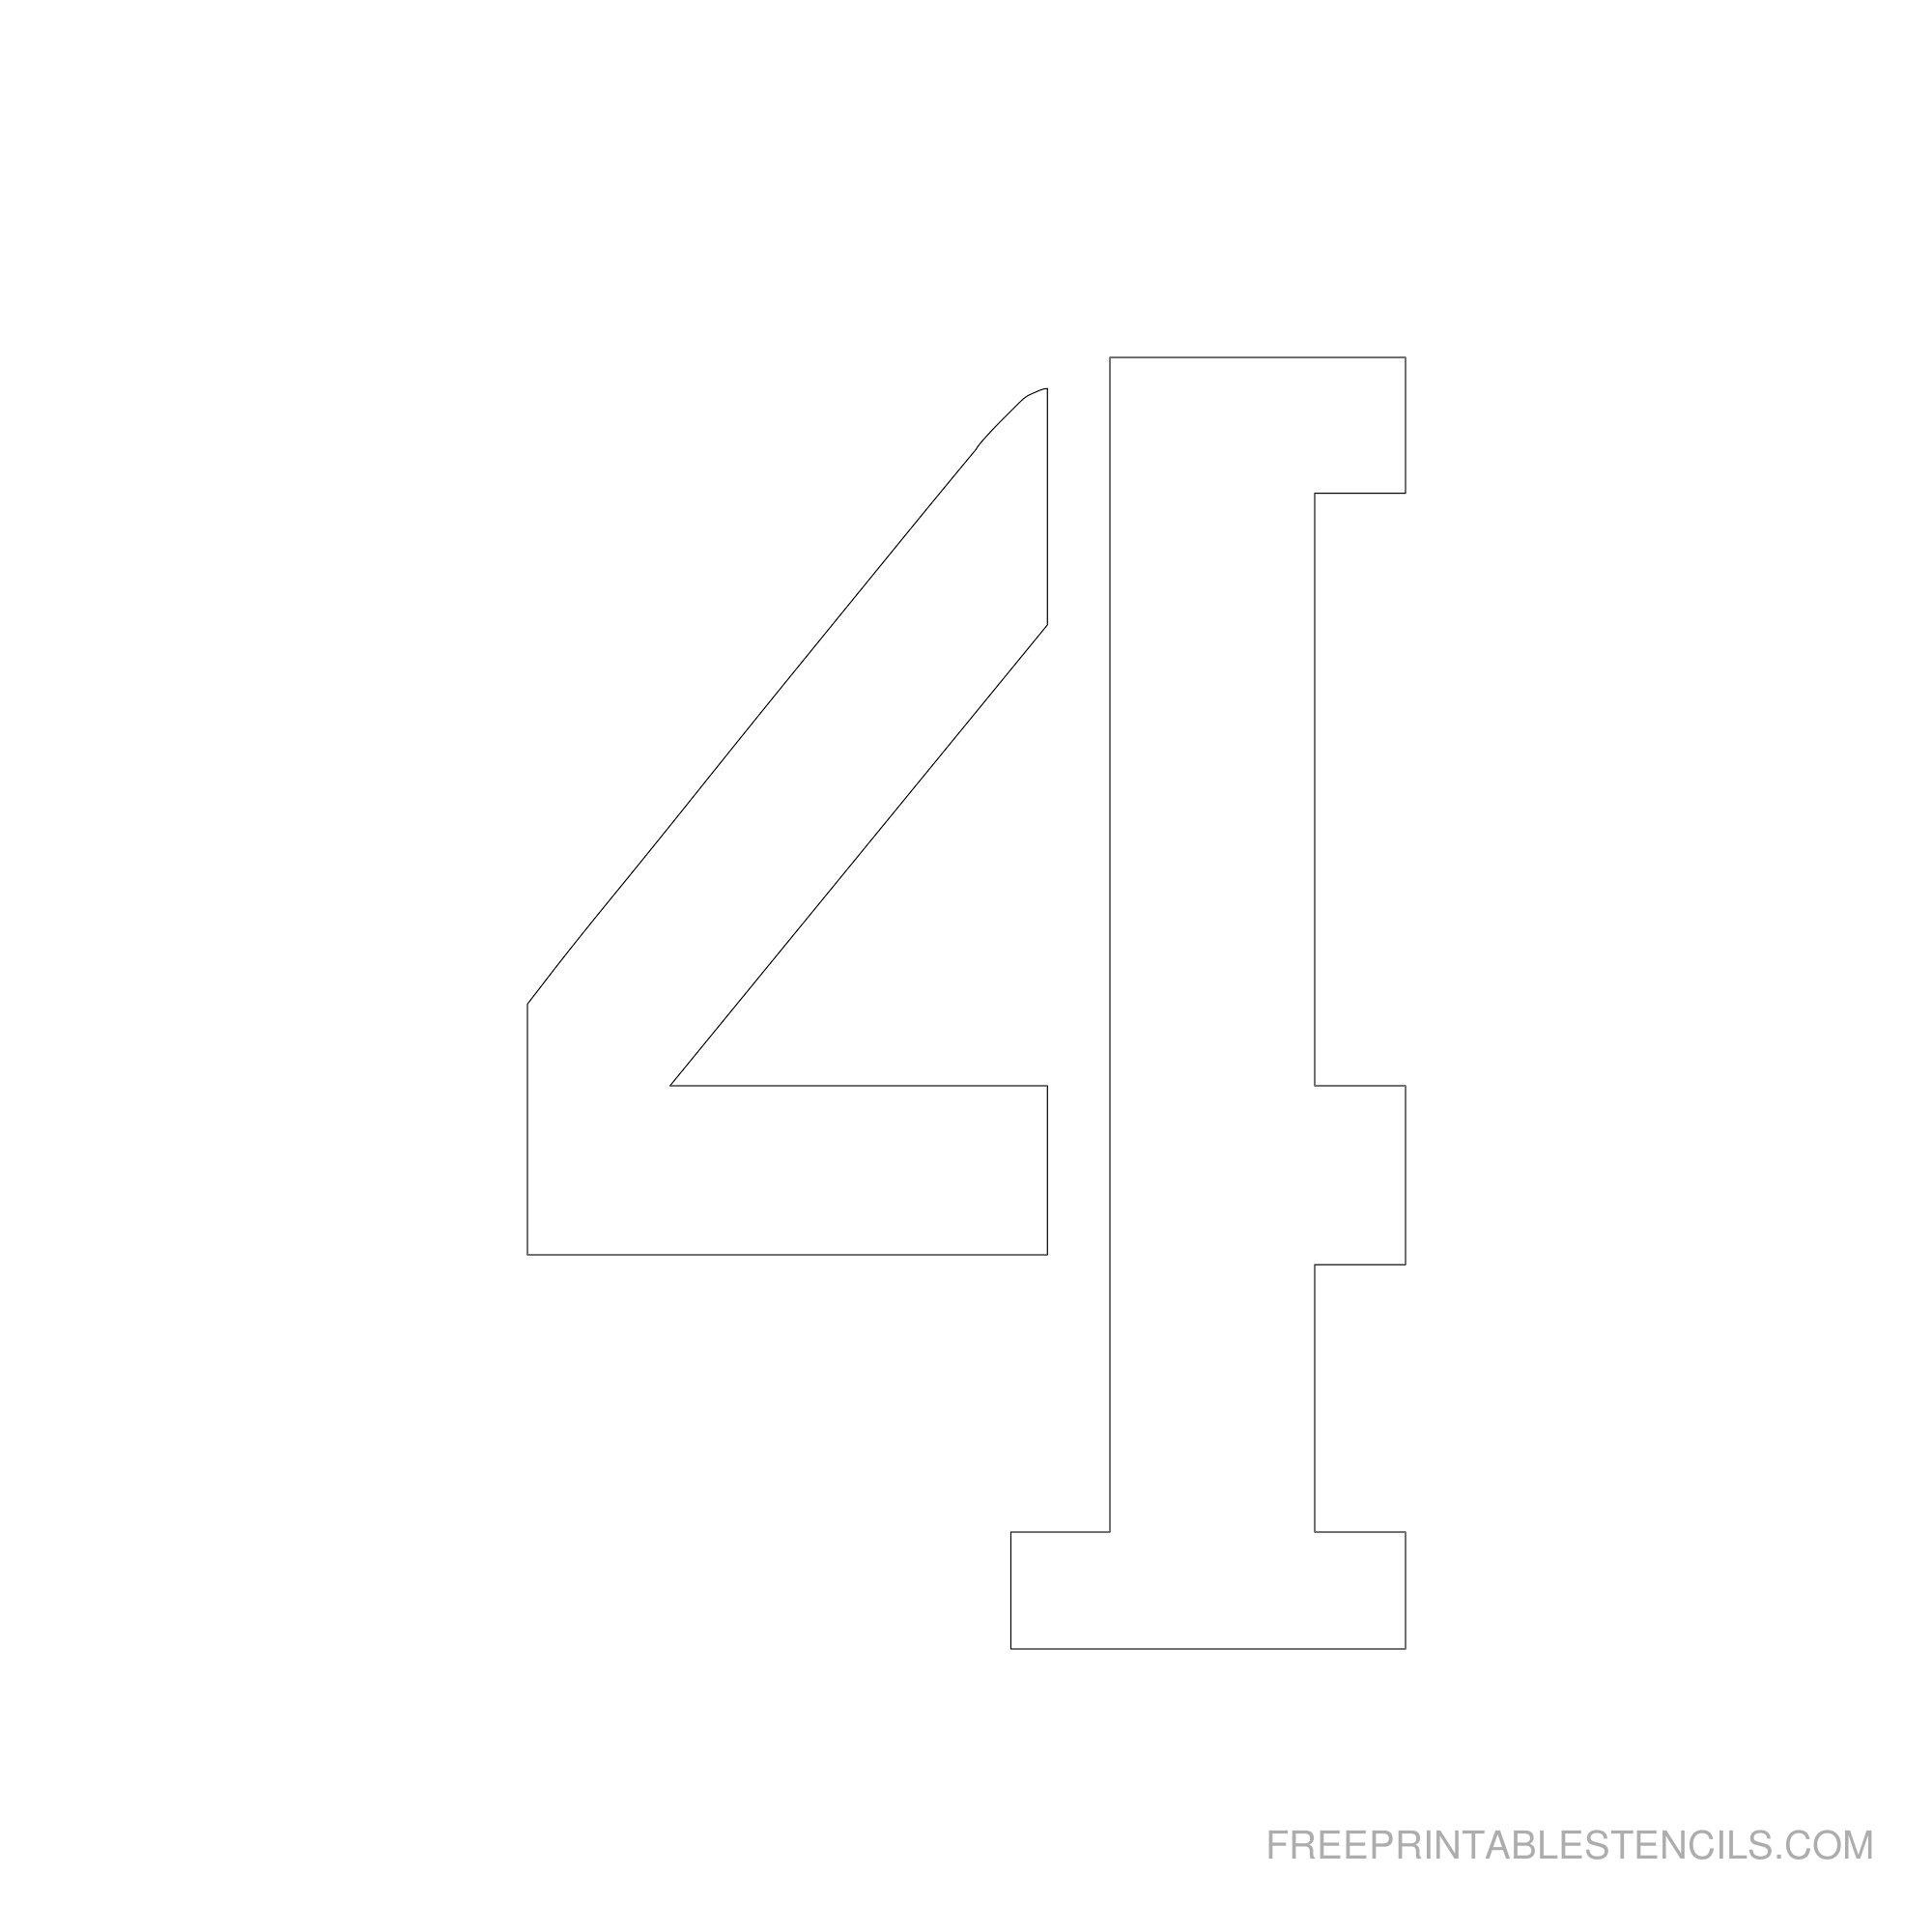 Printable 6 Inch Number Stencils 1-10 | Free Printable Stencils - Free Printable 3 Inch Number Stencils